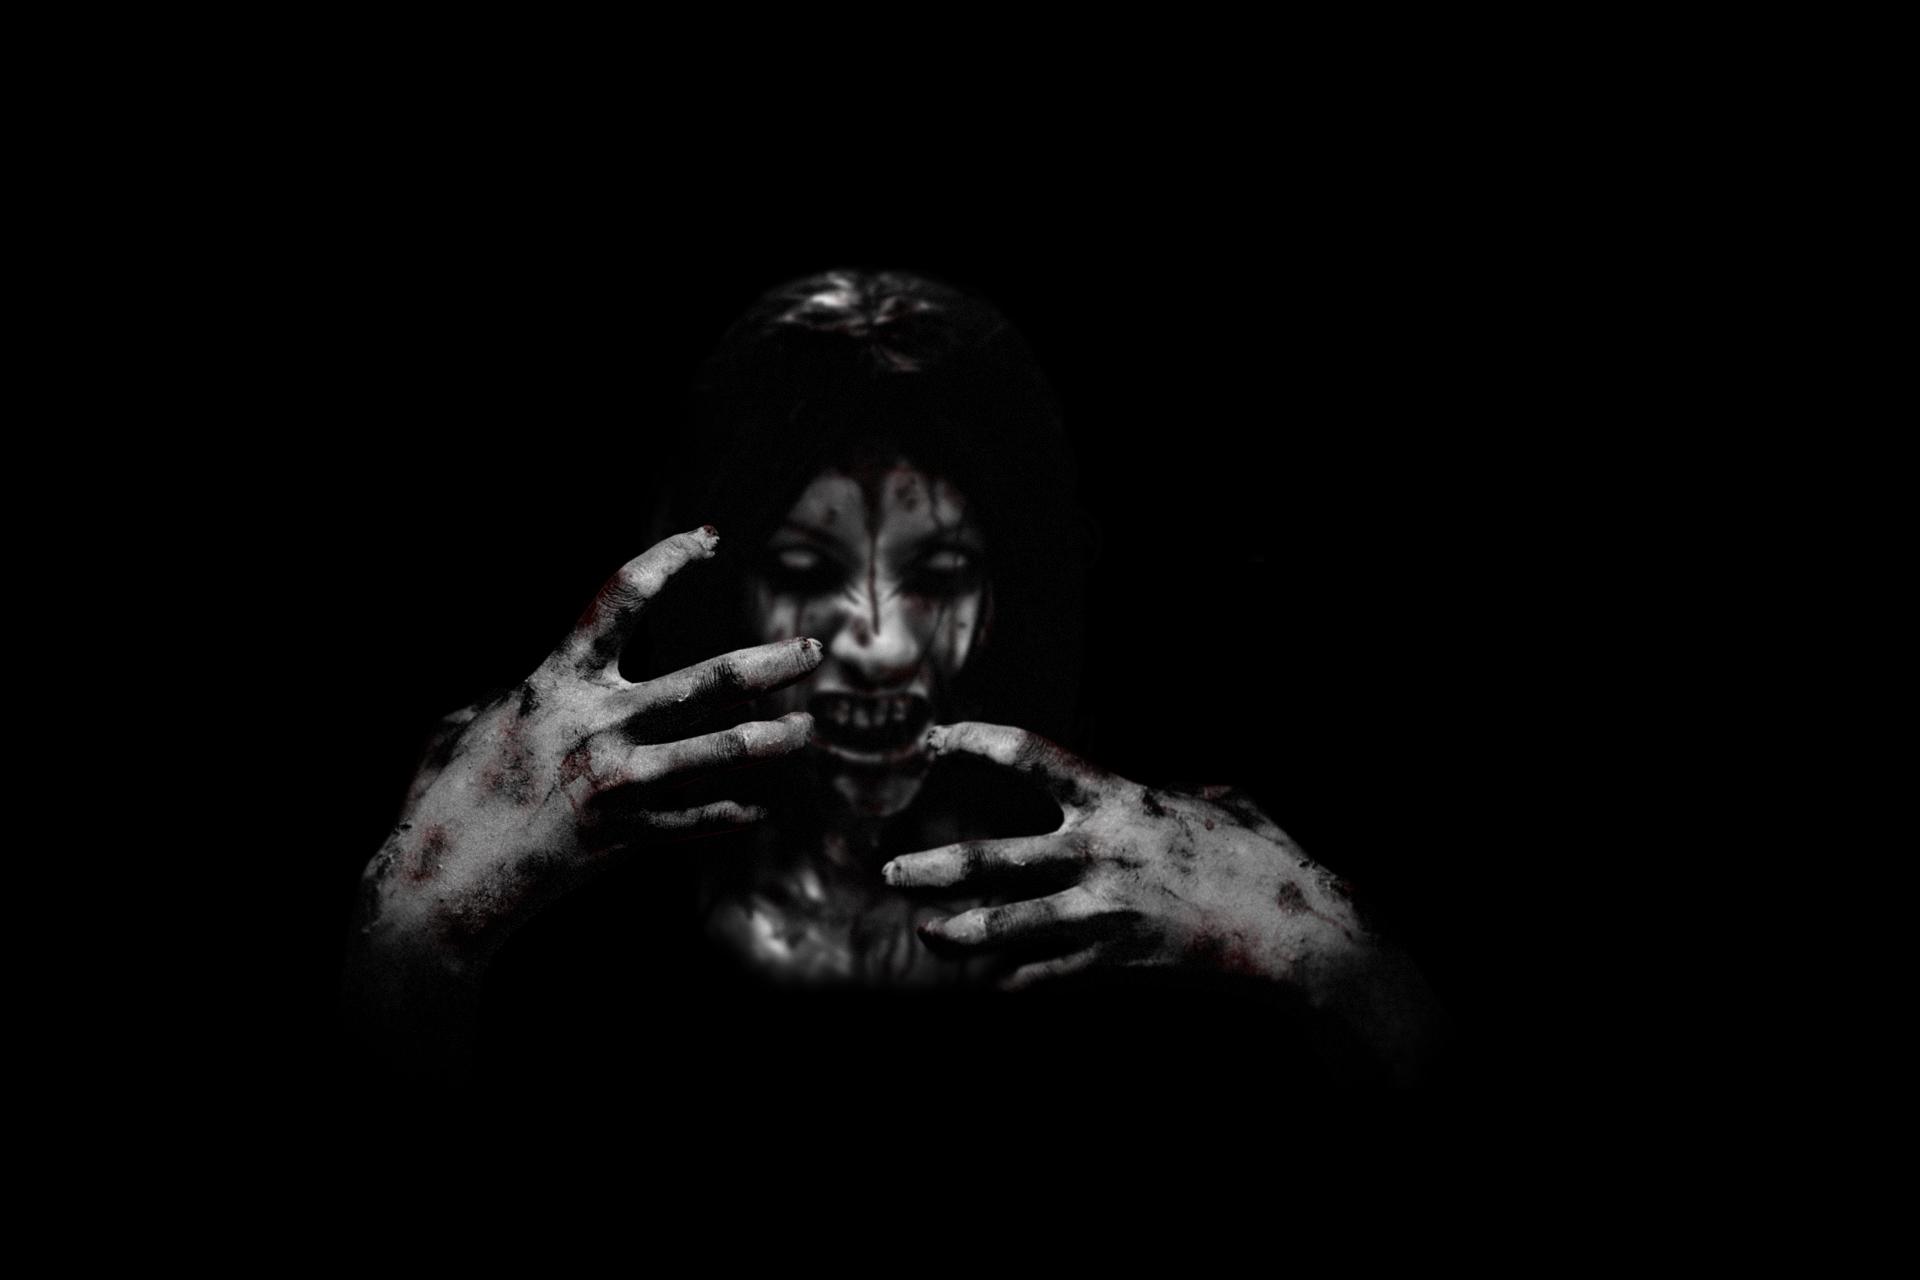 the house creepy black movies demon blood face dark horror